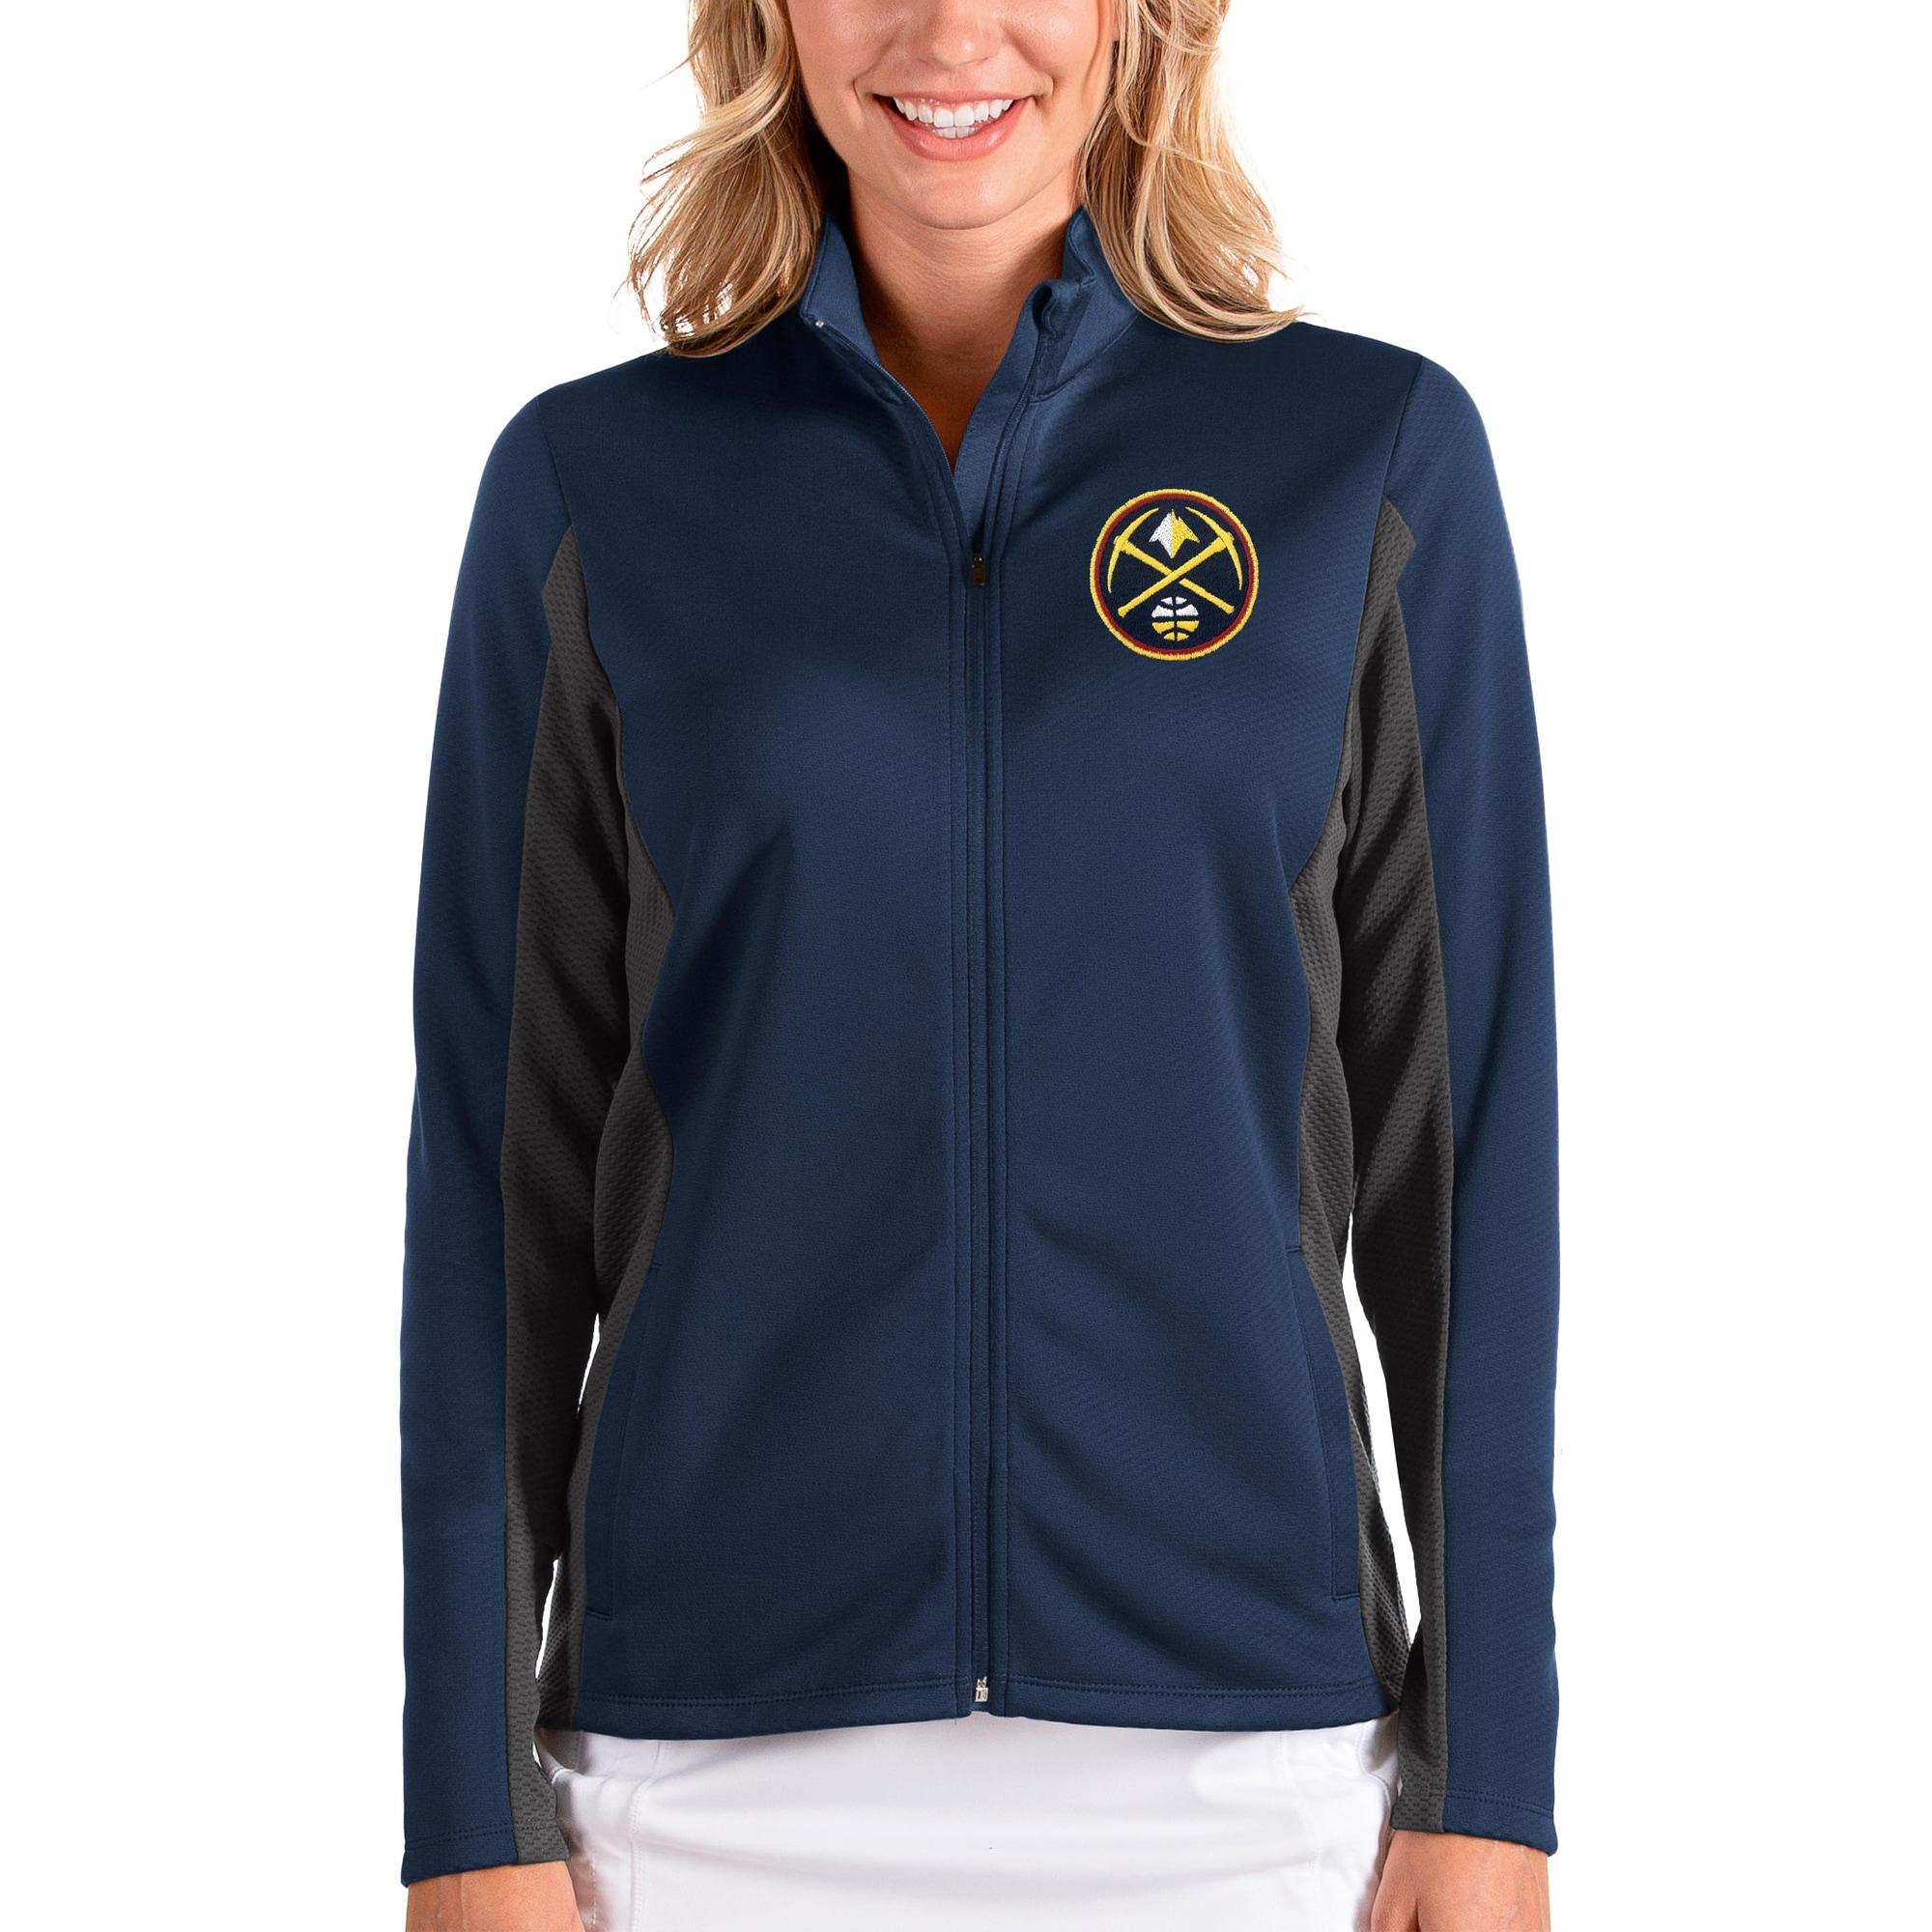 Denver Nuggets Antigua Women's Passage Full-Zip Jacket - Navy/Charcoal